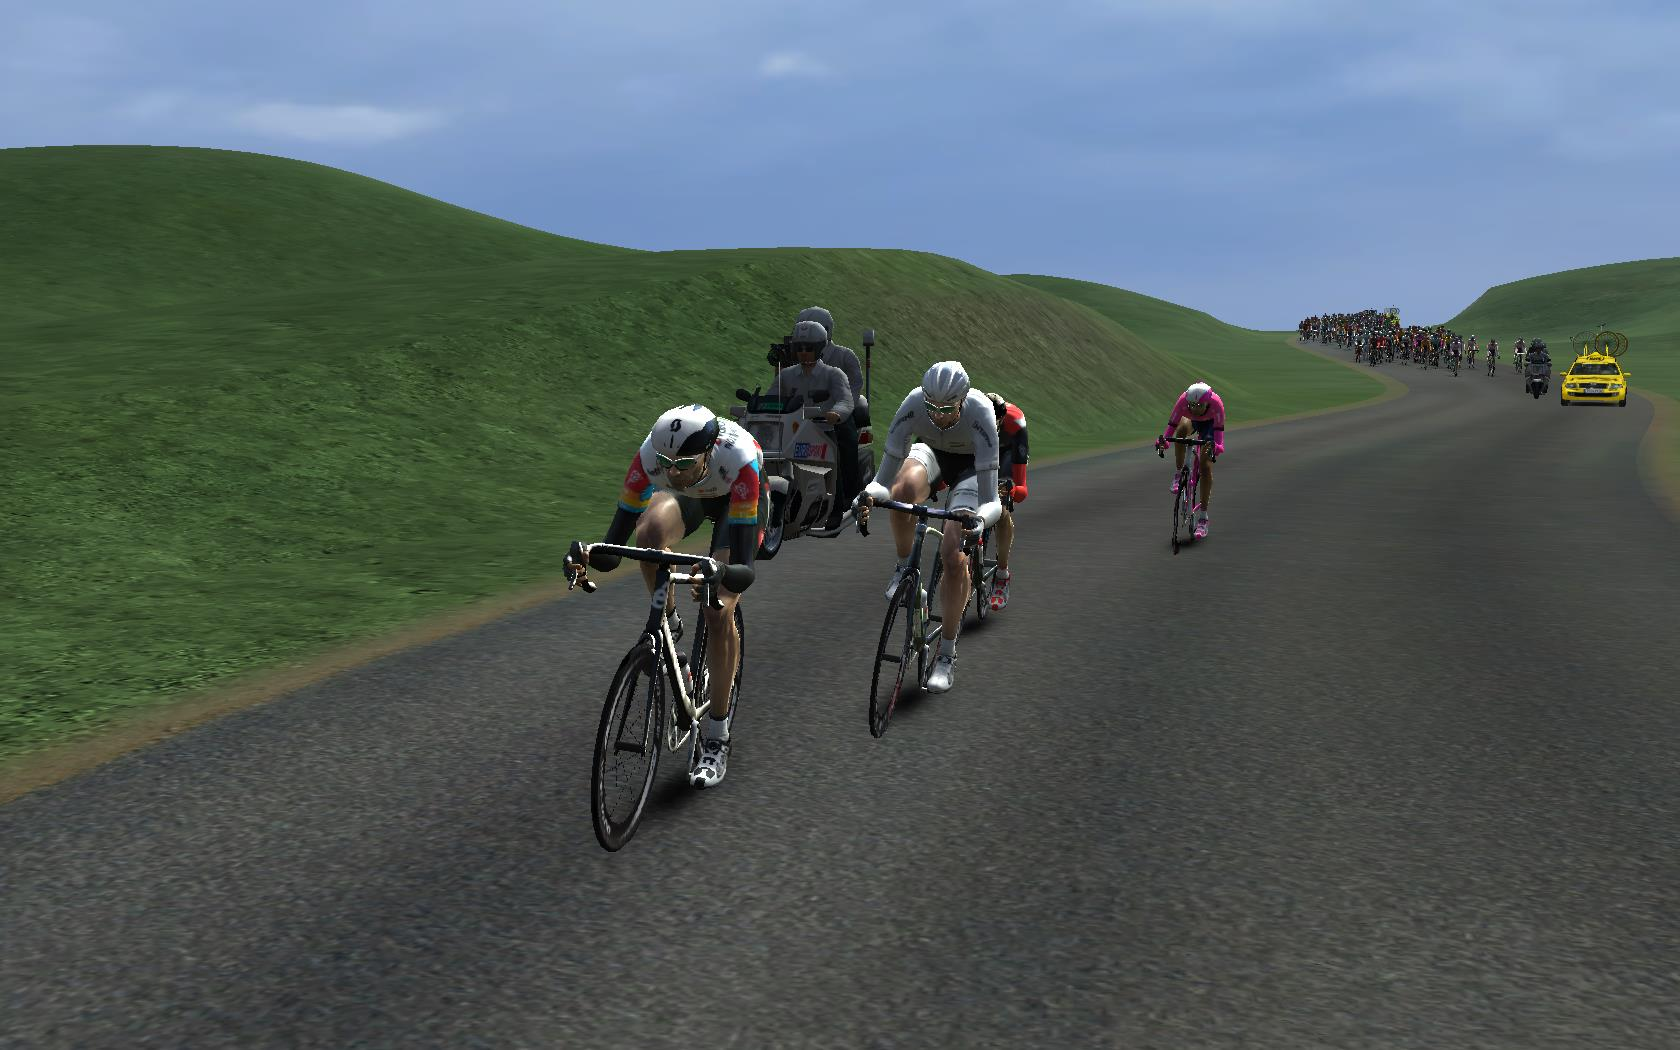 pcmdaily.com/images/mg/2018/Races/C2/USAPCC/3/PCM0002.jpg